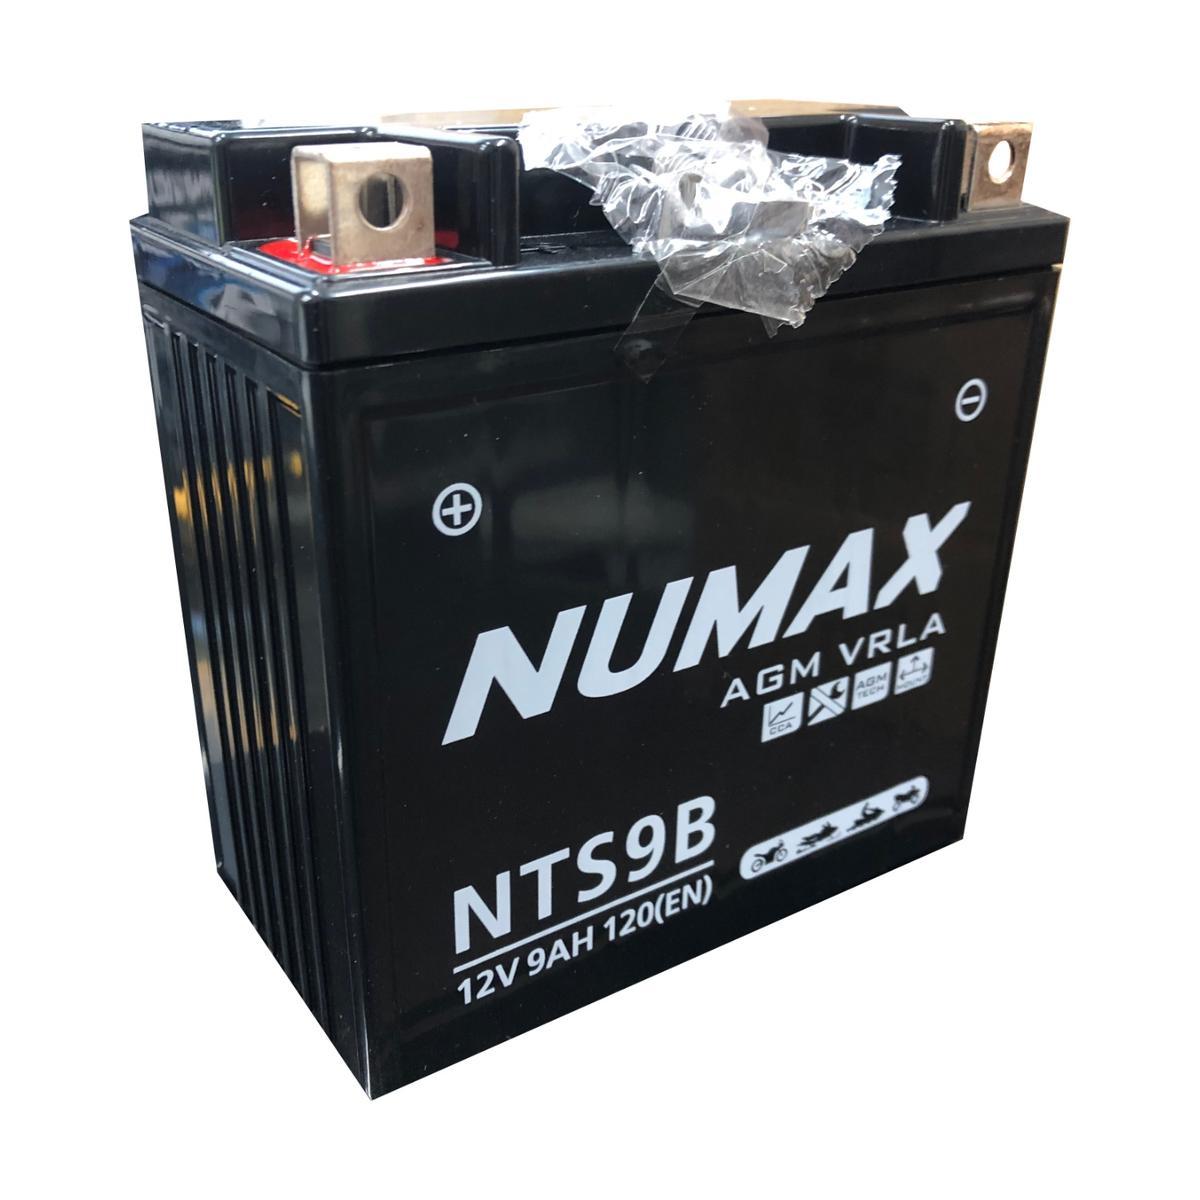 Numax NTS9B 12v Bike Motorbike Motorcycle Battery PEUGEOT 100cc Elyseo YB9L-B